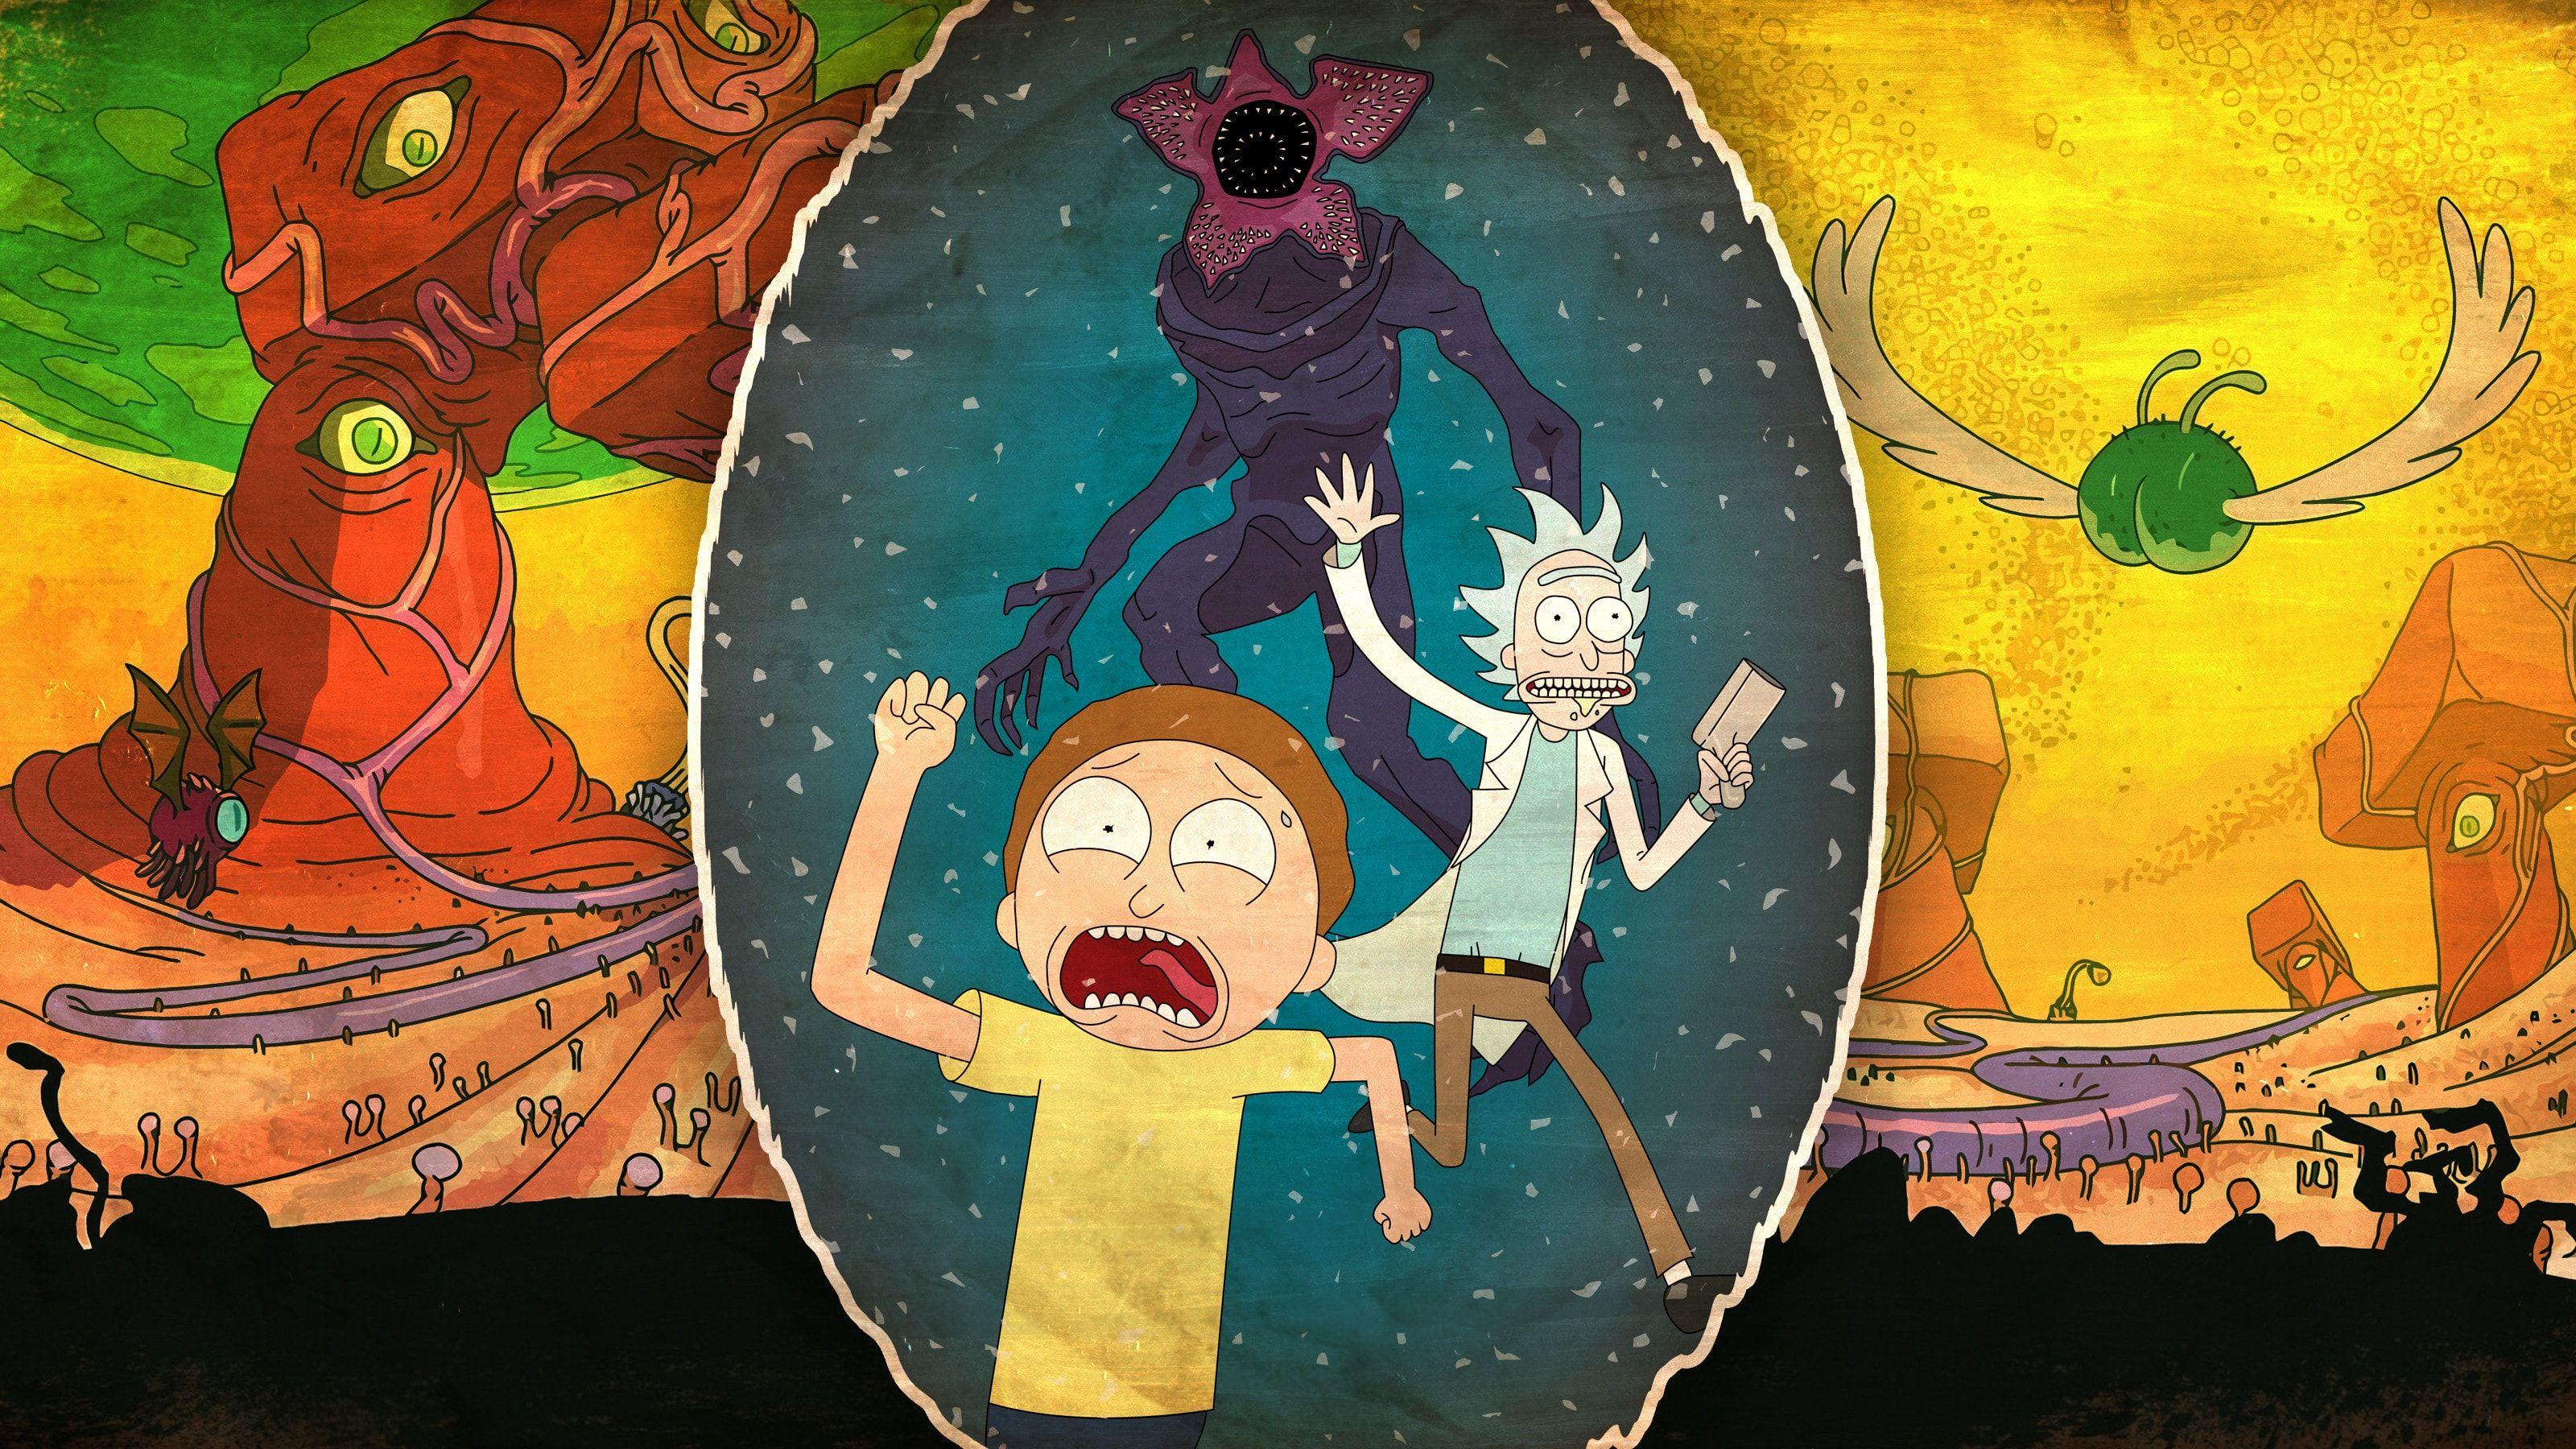 Rick And Morty Run Hd Wallpaper Cartoon Wallpaper Rick And Morty Character Wallpaper Get inspired for ultra hd rick and